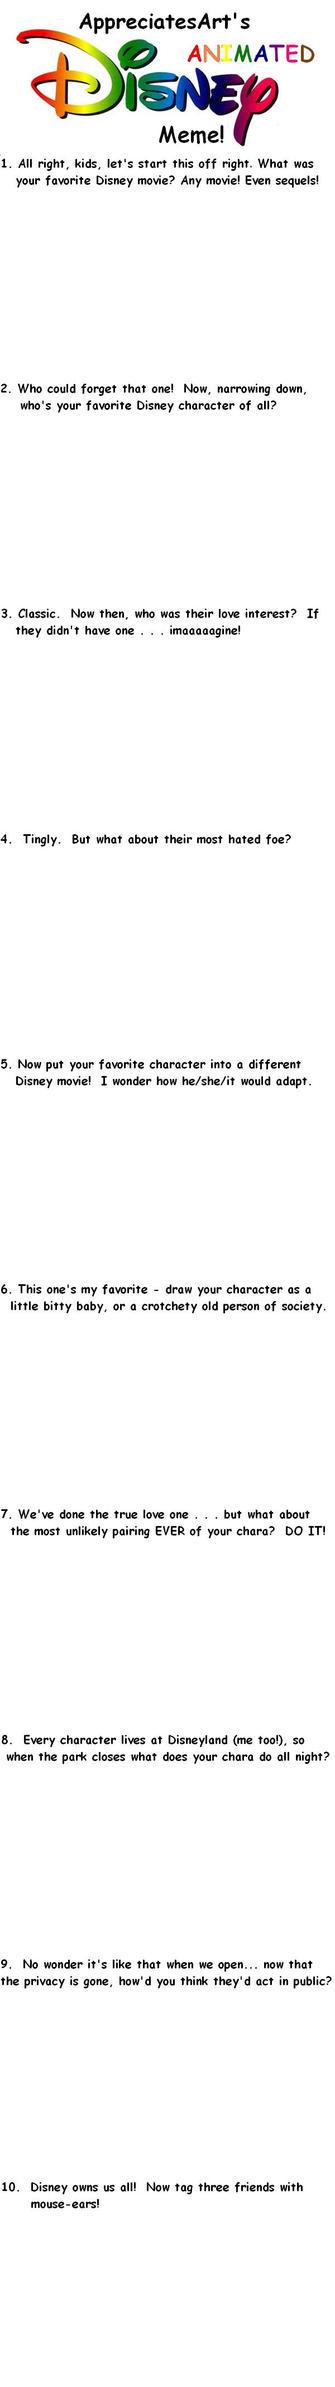 The Disney Movie Meme by AppreciatesArt